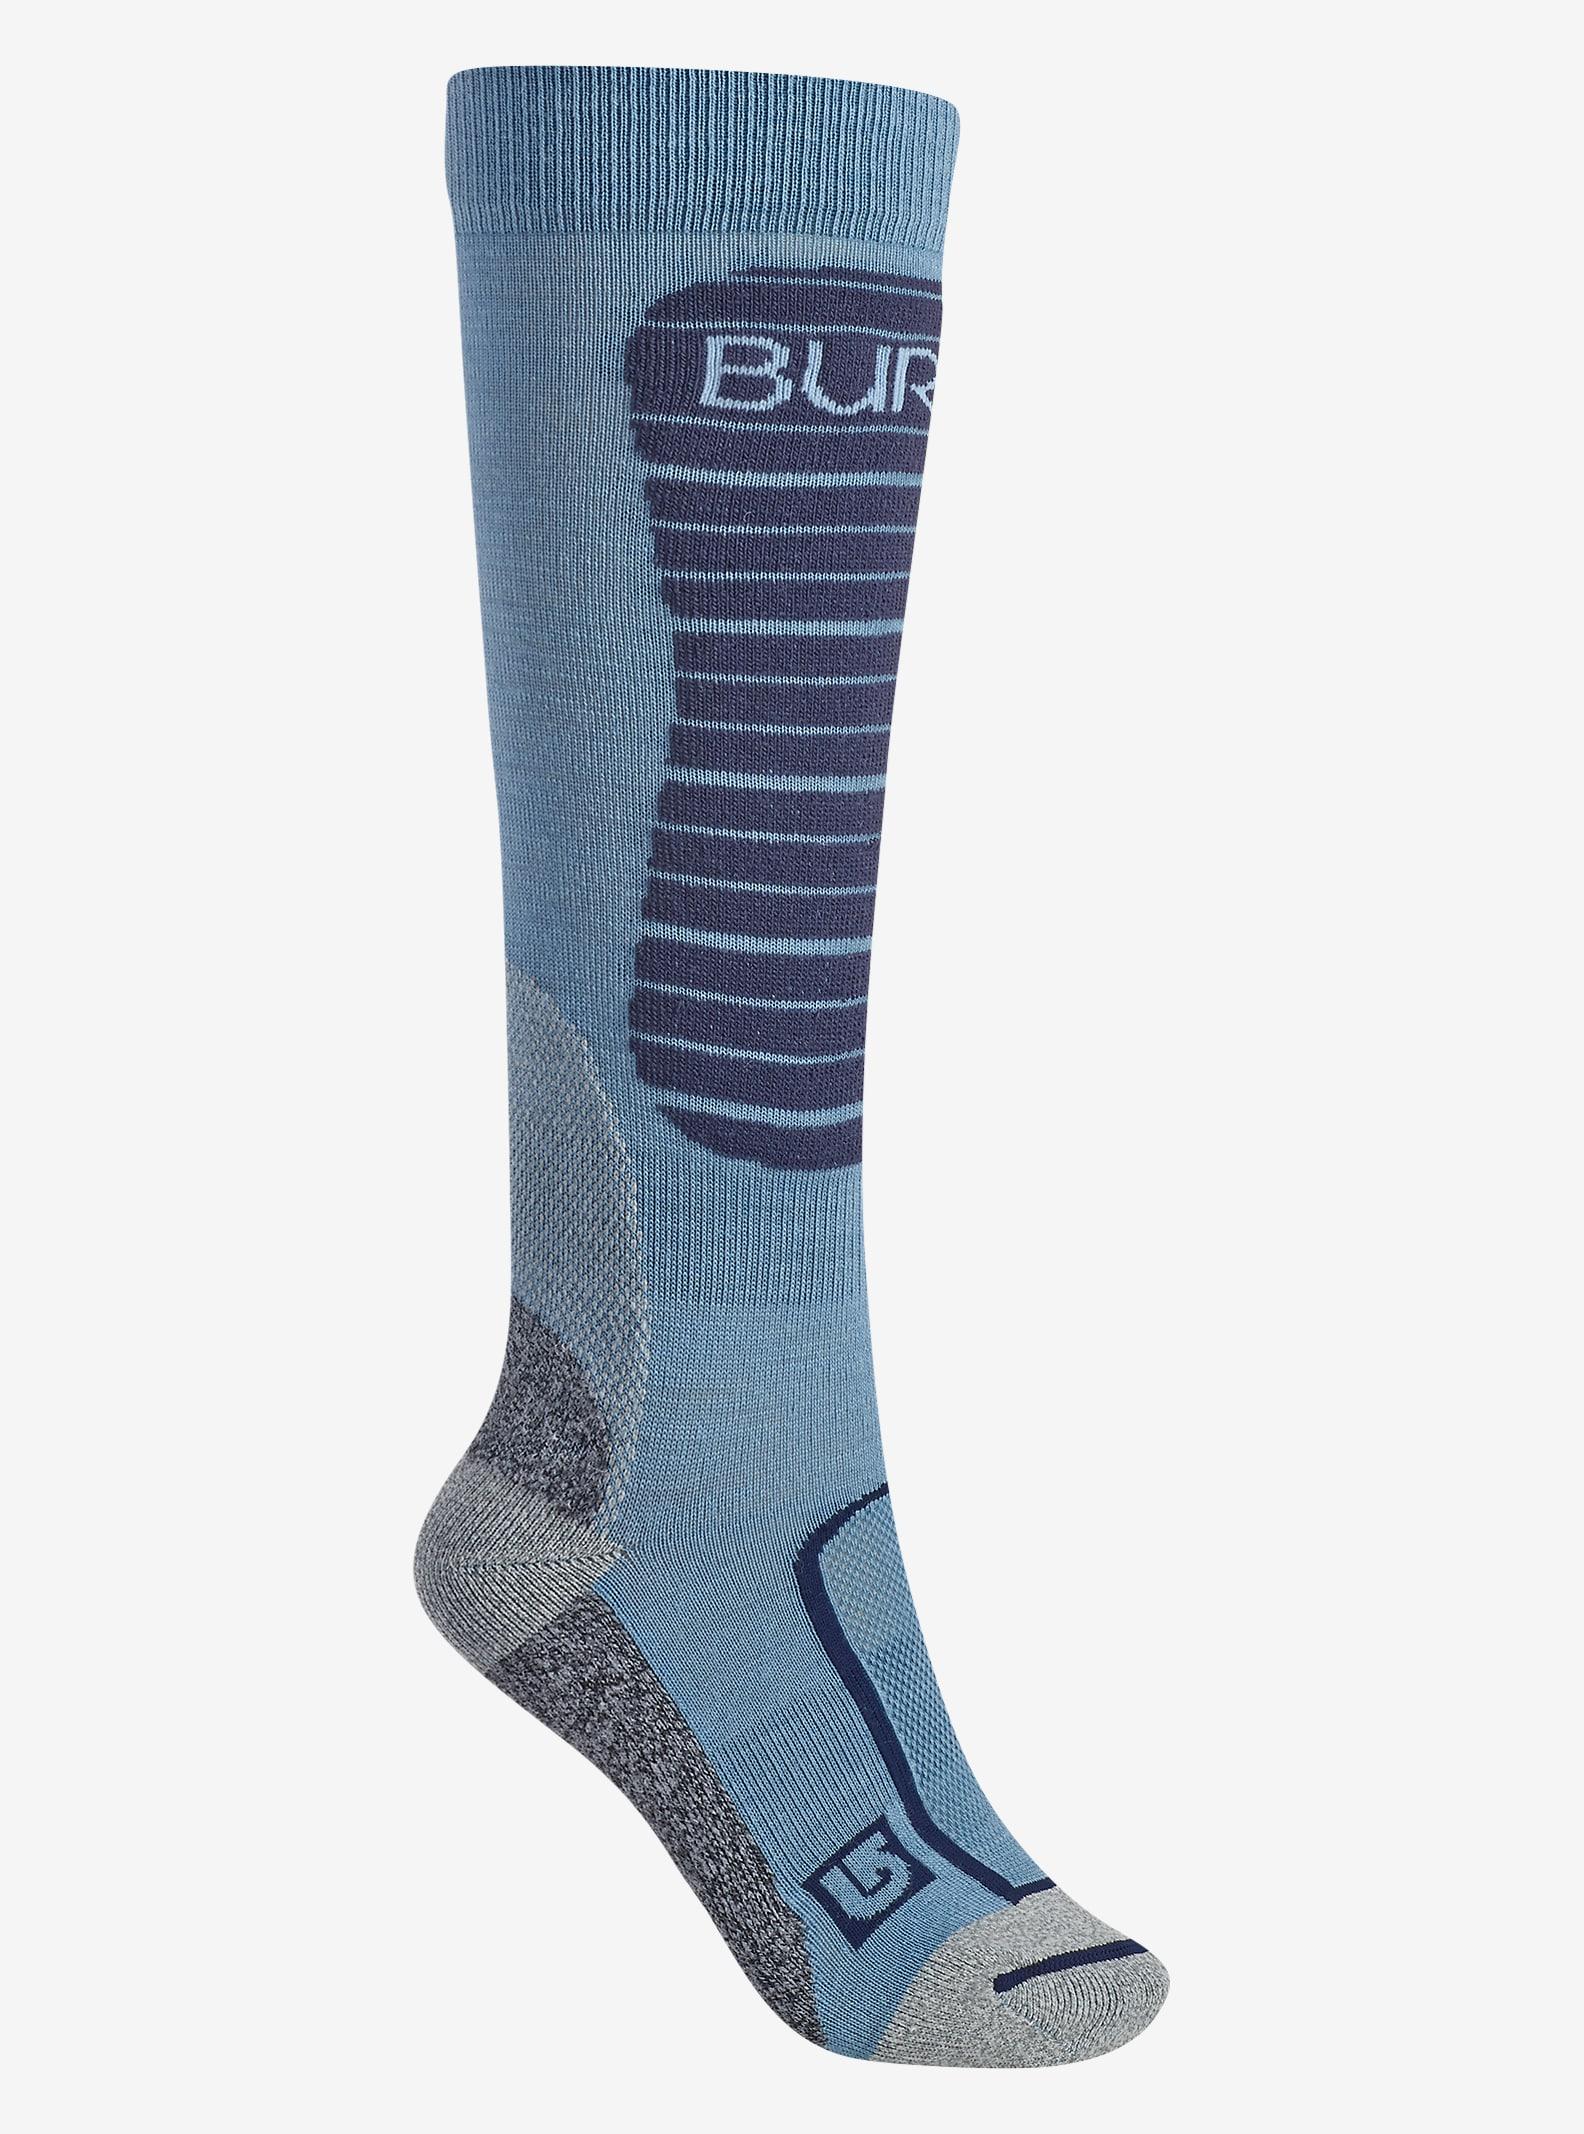 Burton Merino Phase Sock shown in Infinity